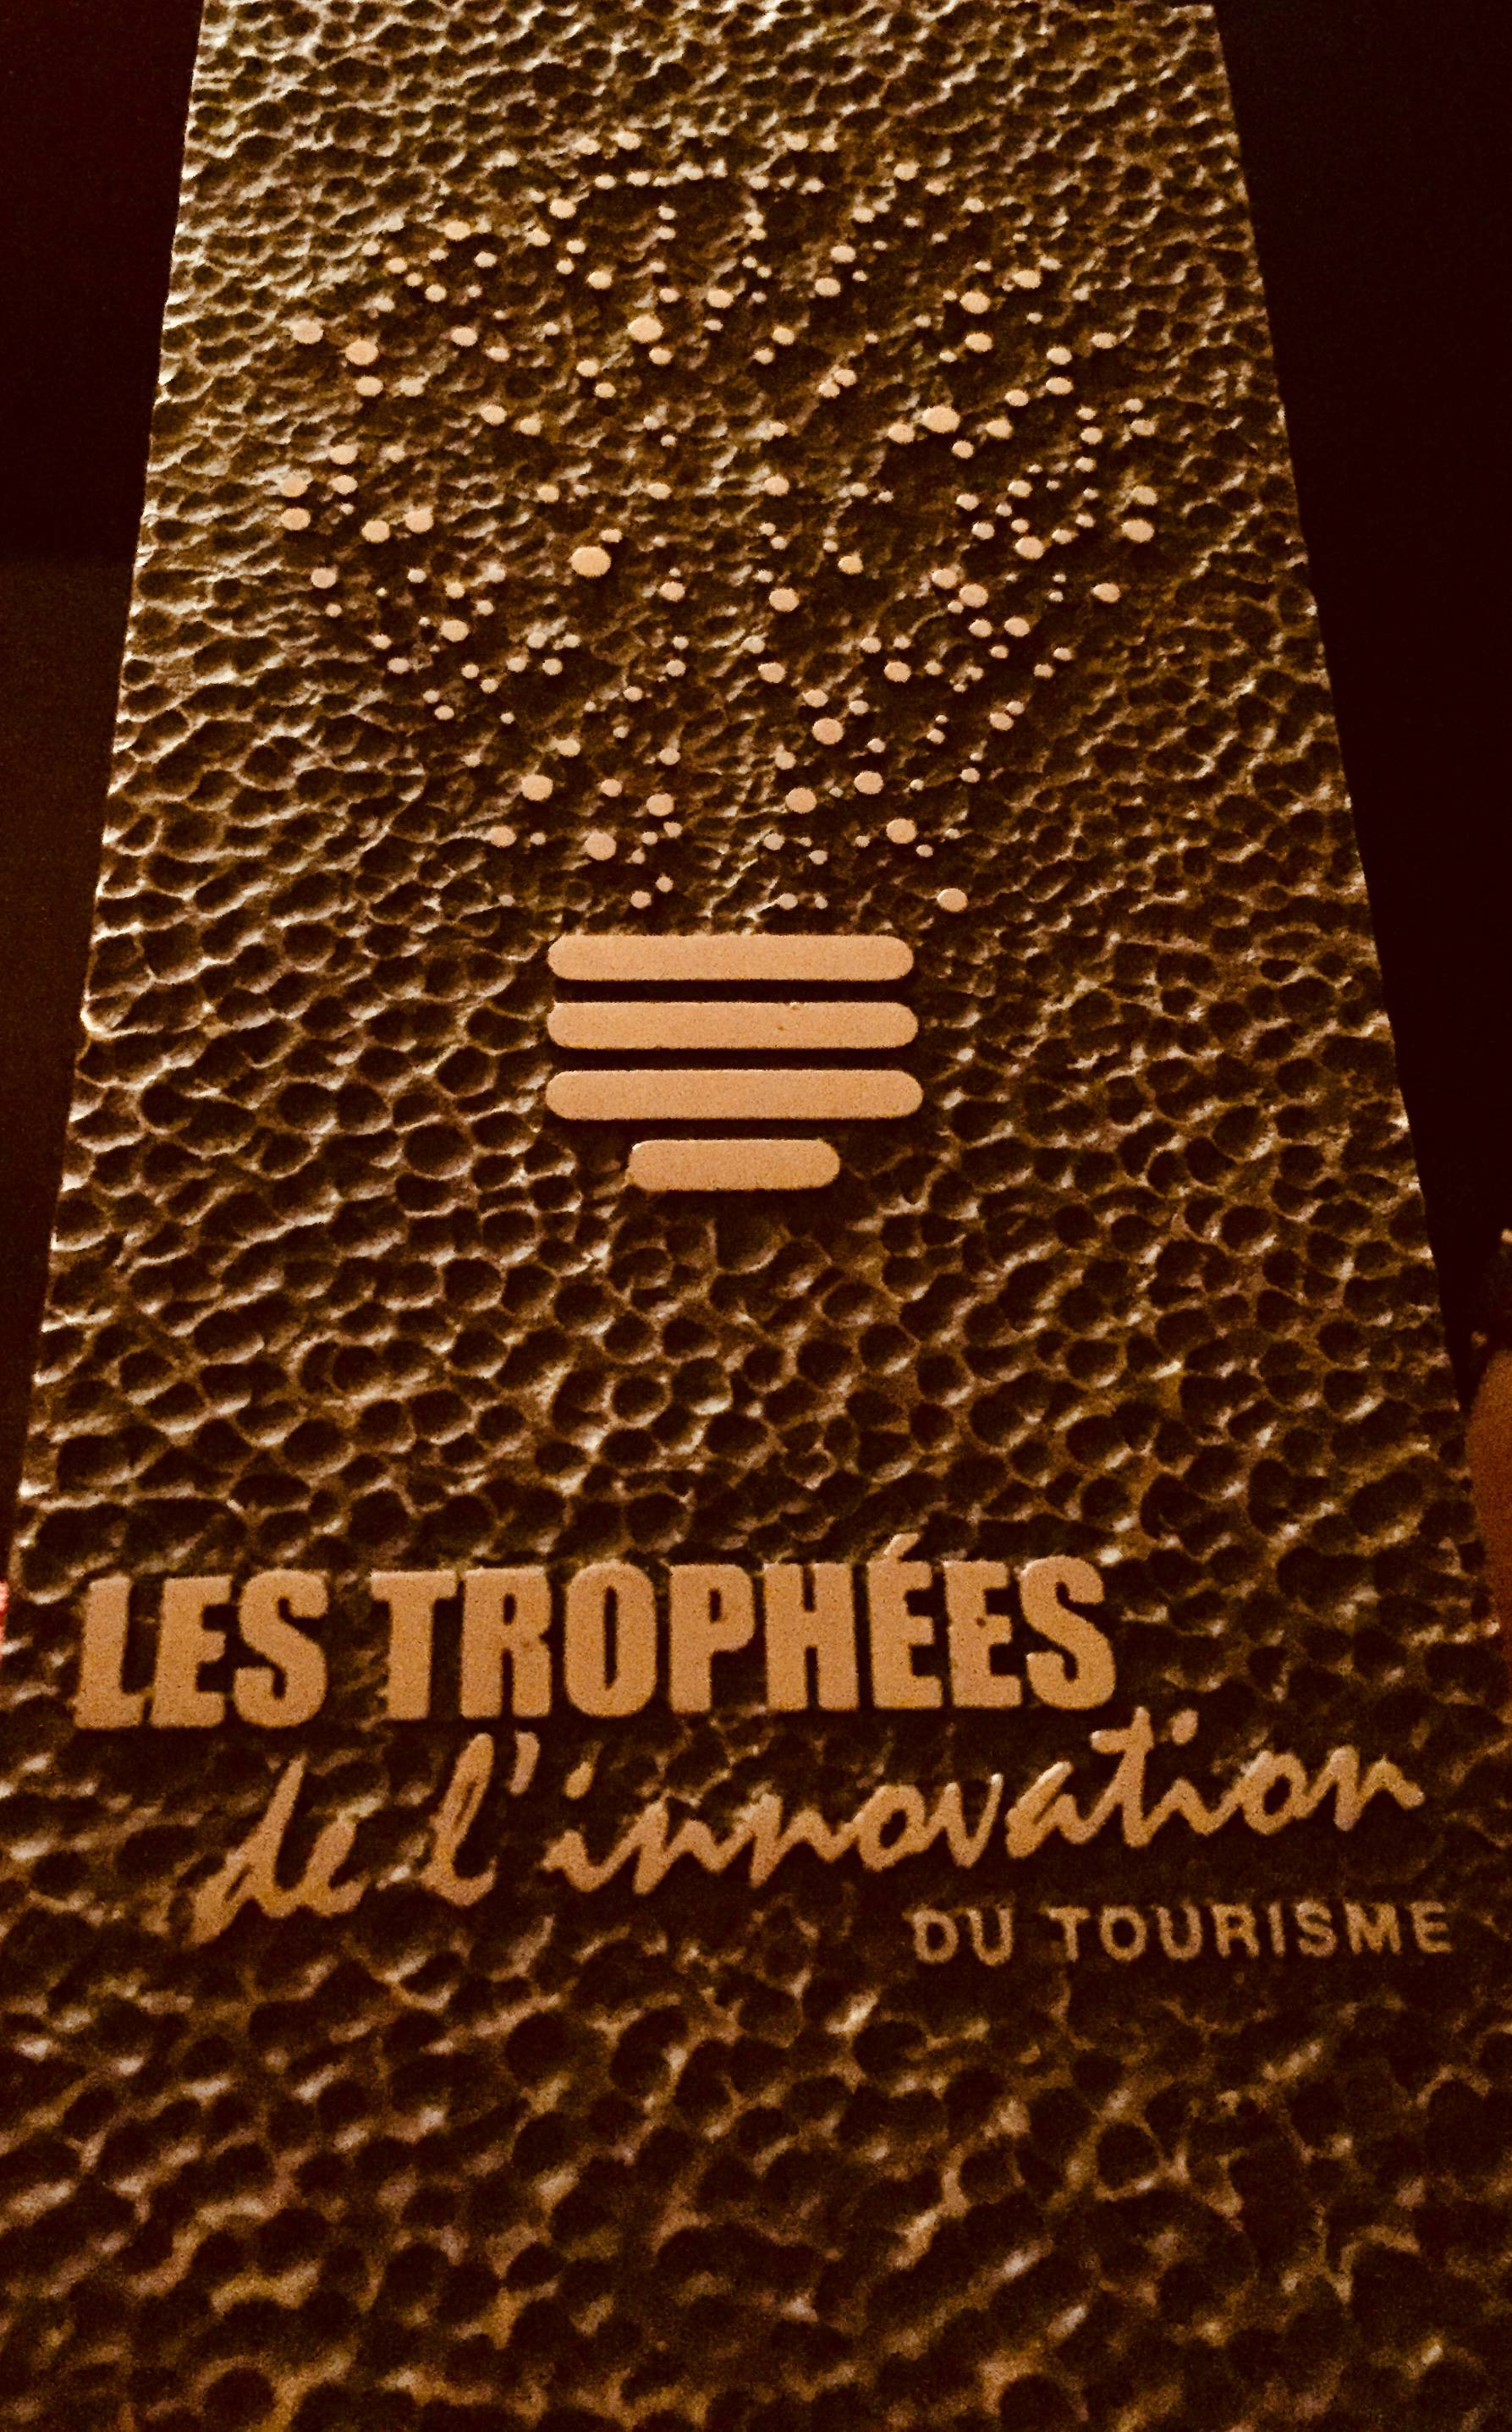 Trophee Innovation Touristique 2018